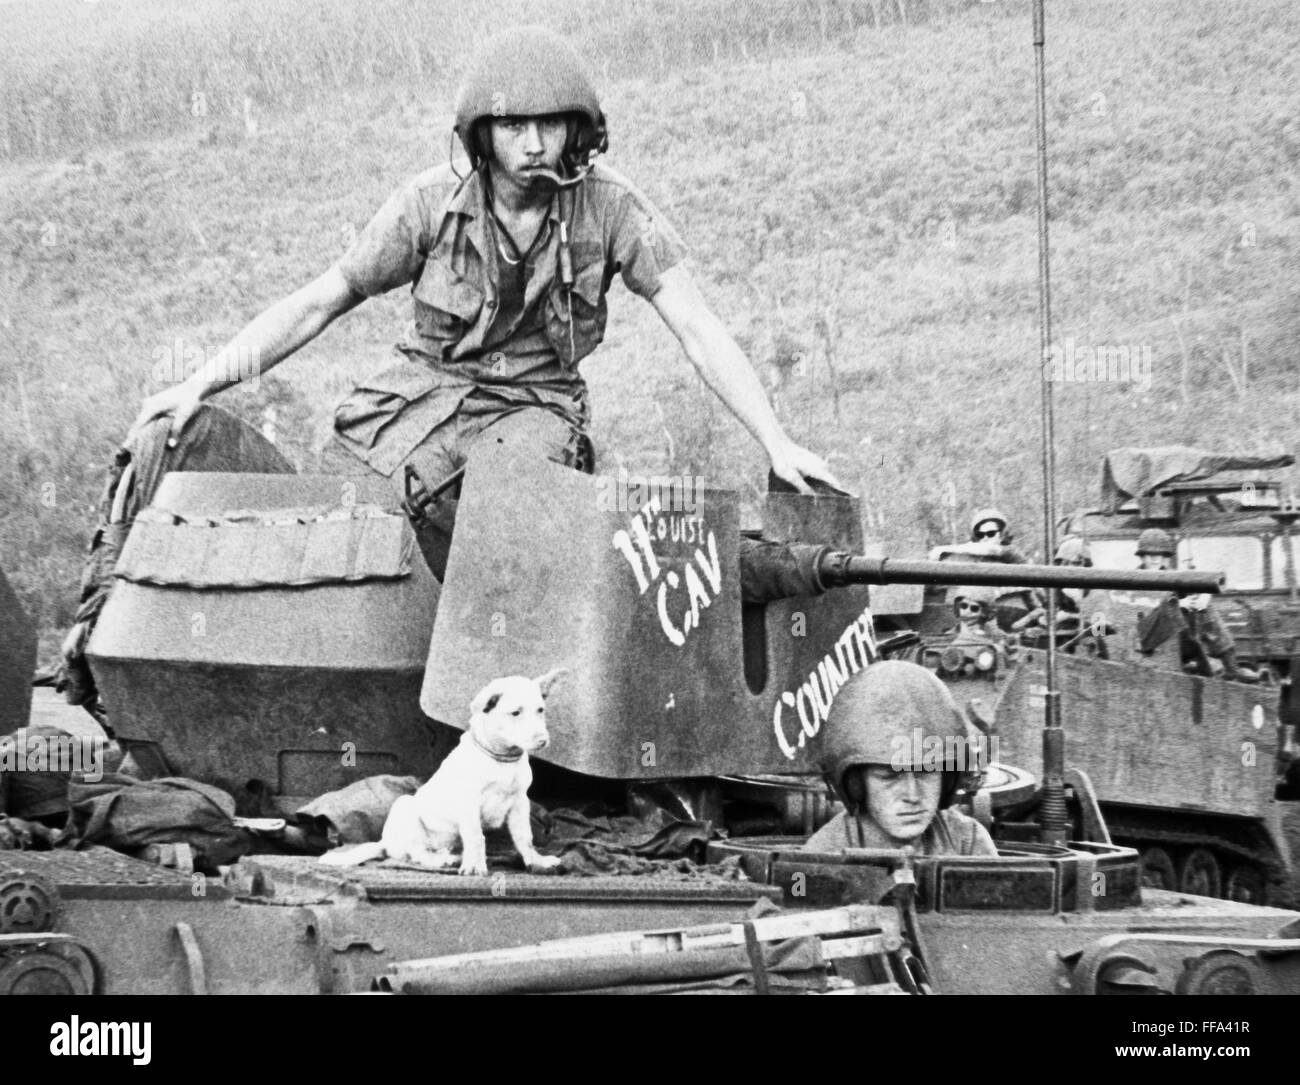 Vietnam War 1954-1975 Vietnam-war-11th-cavalry-nthe-canine-mascot-of-a-us-eleventh-armored-FFA41R